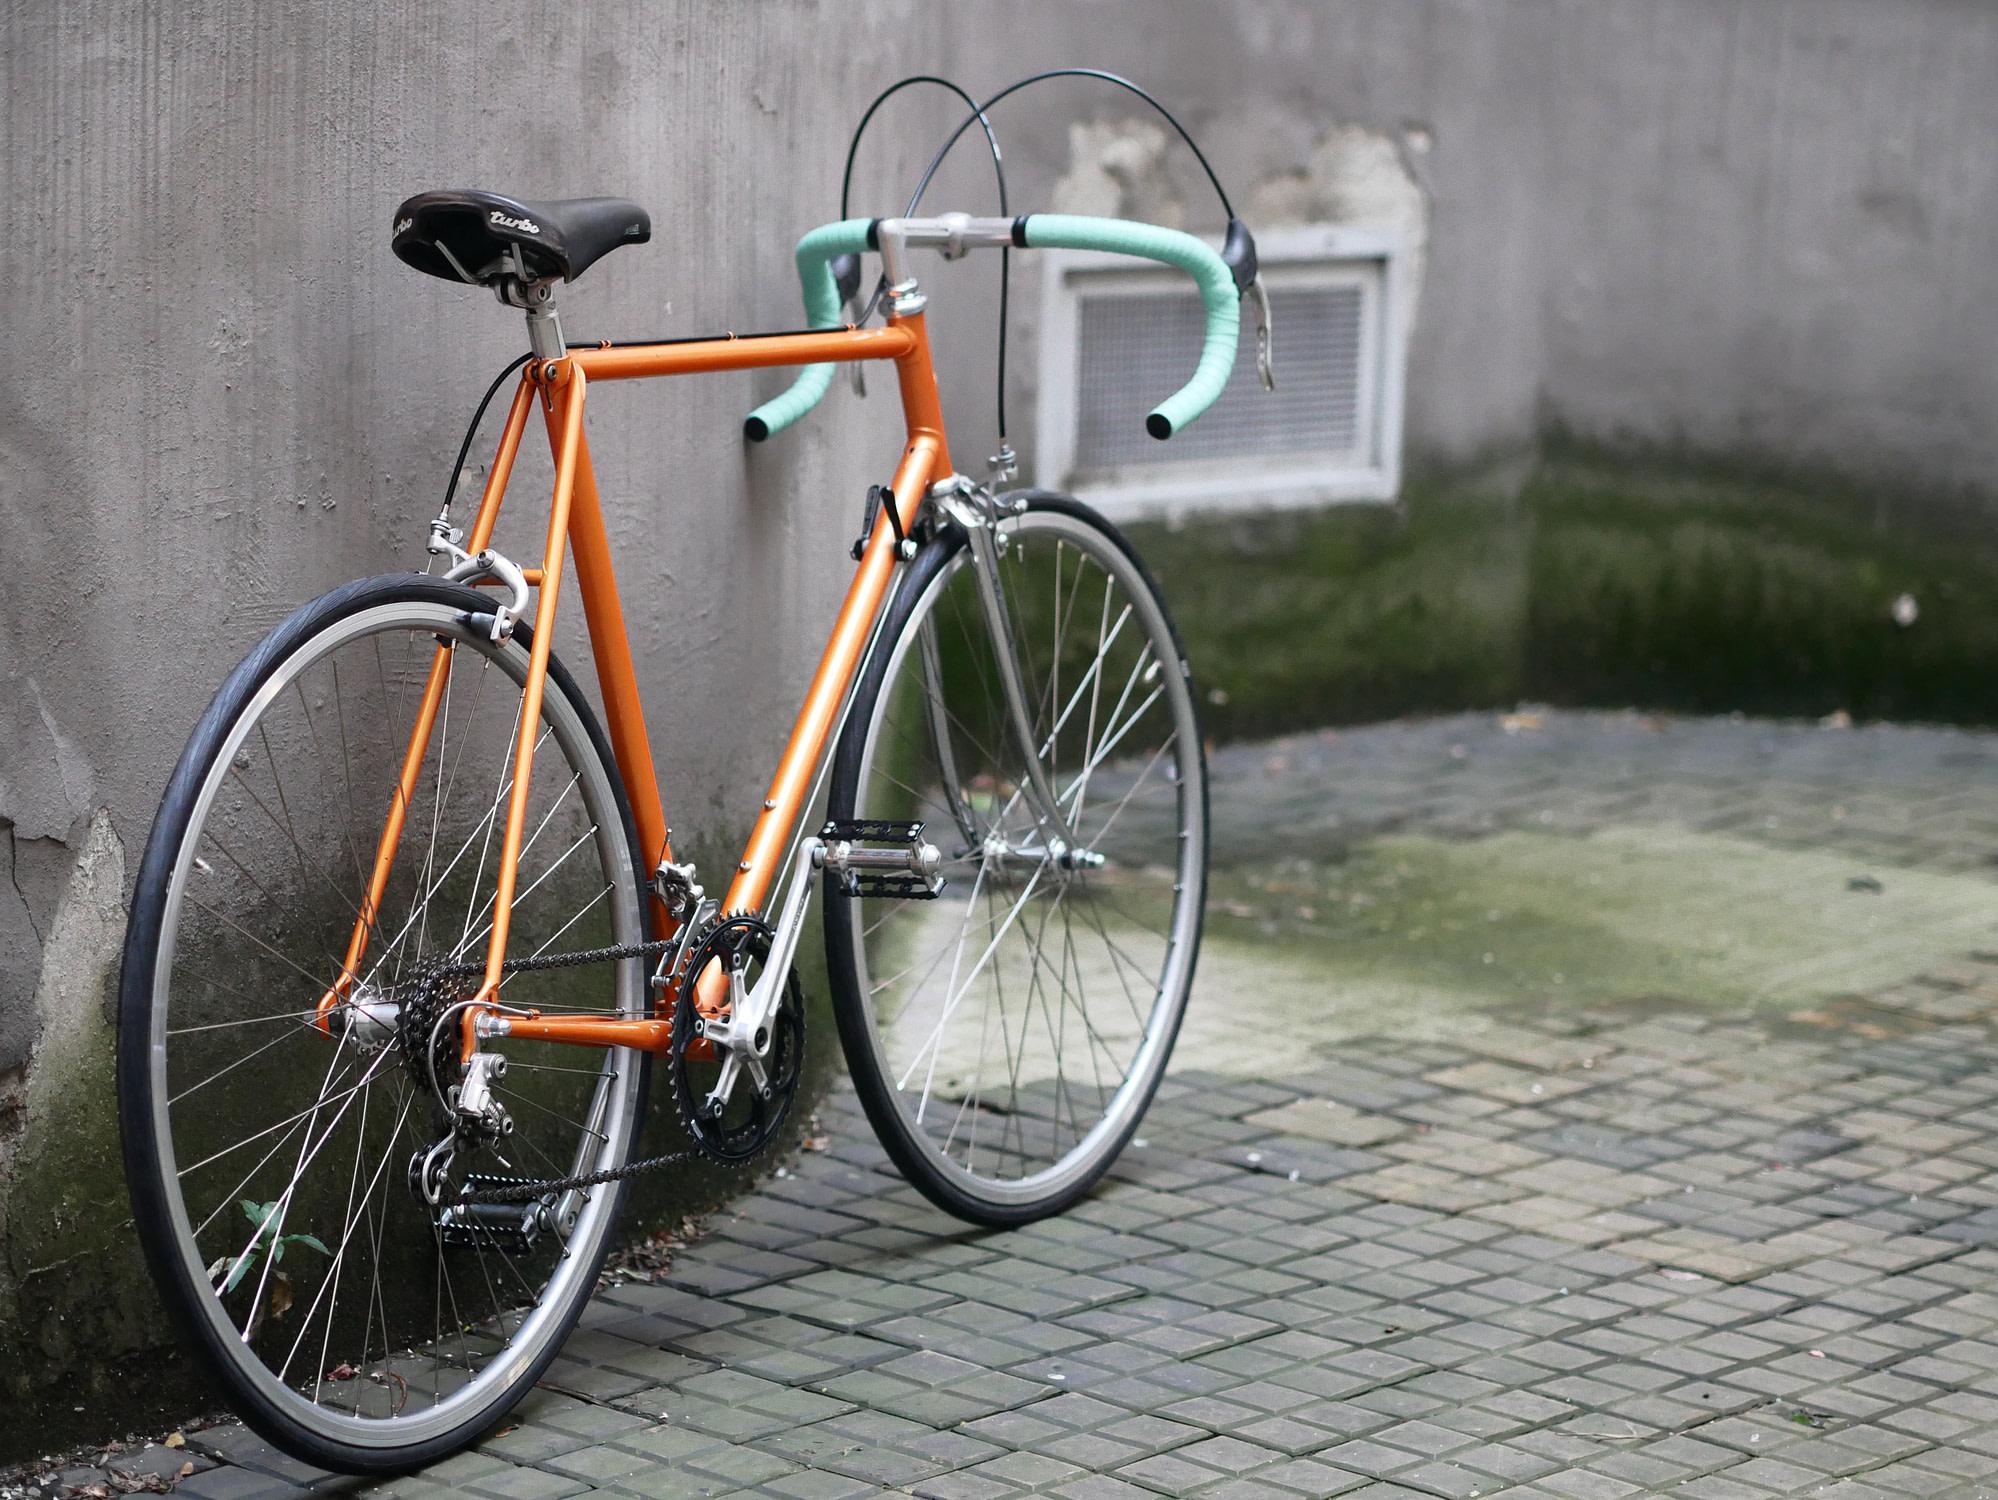 P1140024 scaled - Koga Miata - Orange